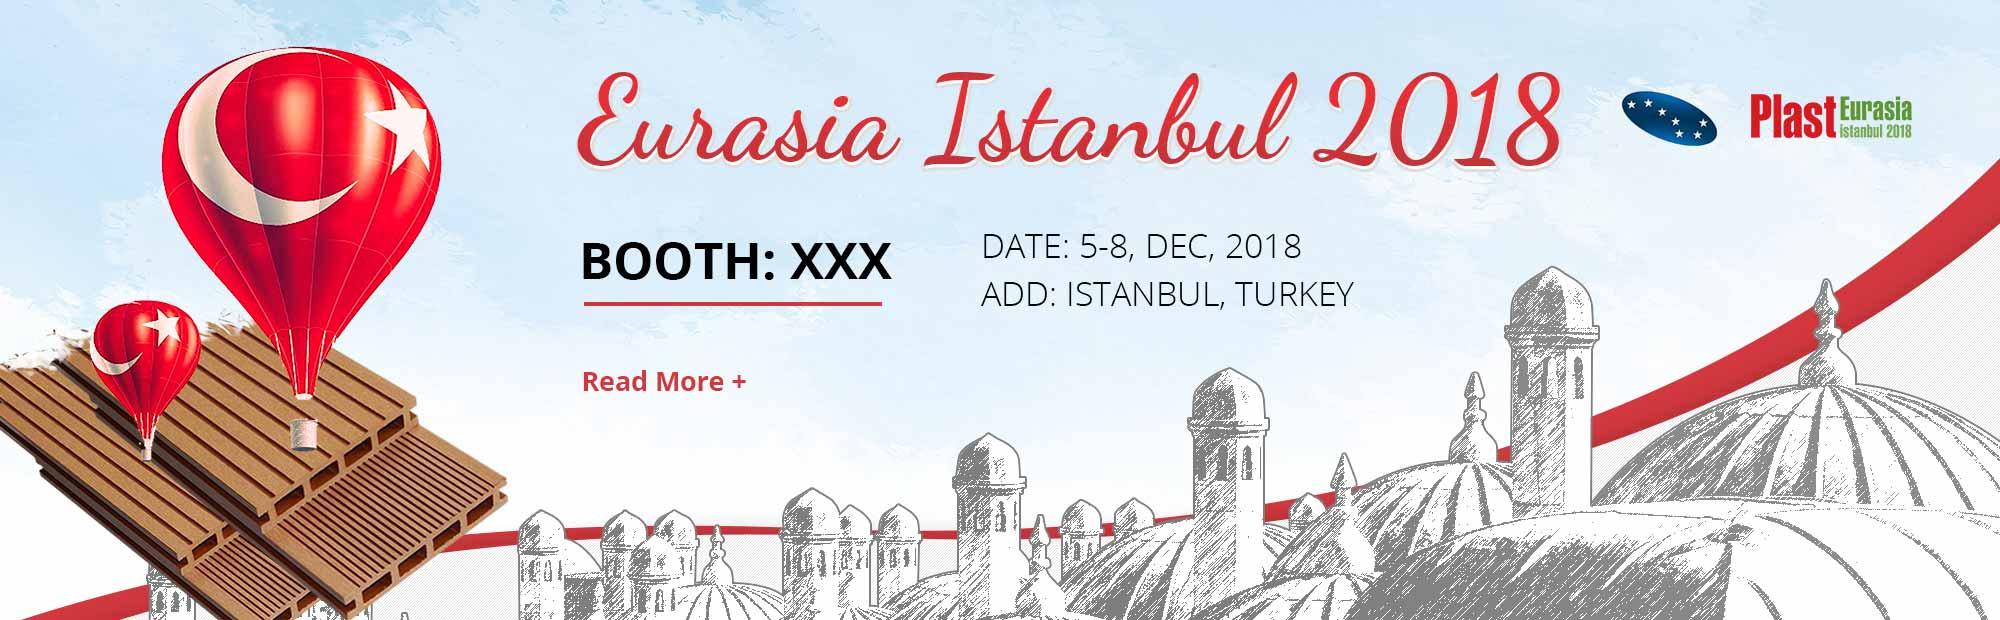 Turkey-Exhibition Sevenstarsgroup